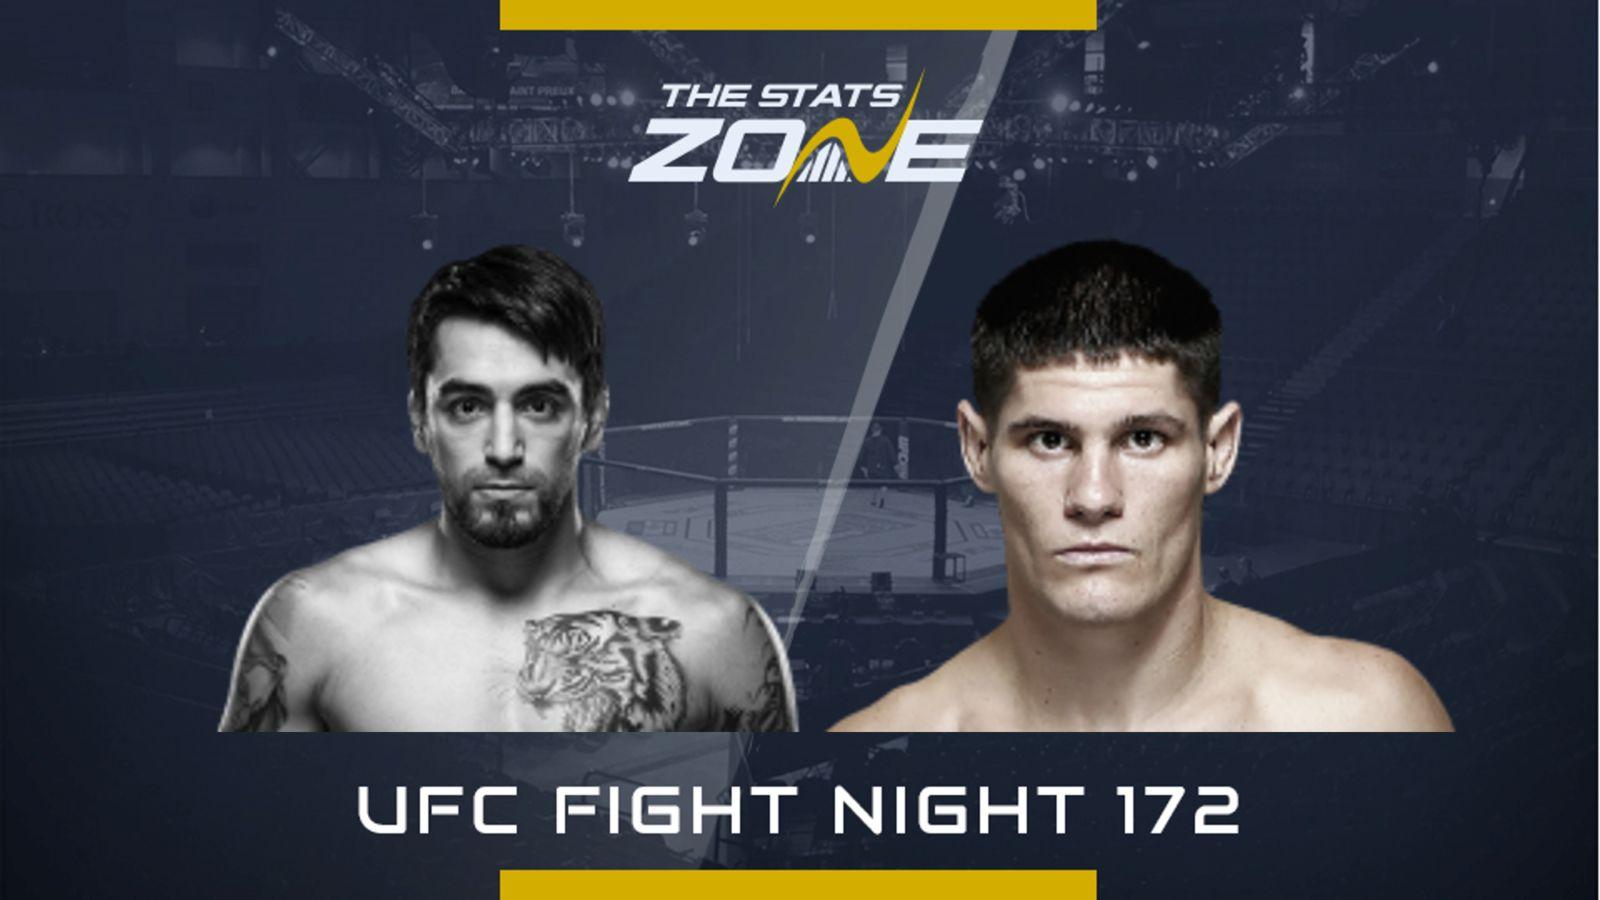 Ufc Fight Night 172 In 2020 Ufc Fight Night Ufc Mma Fighters